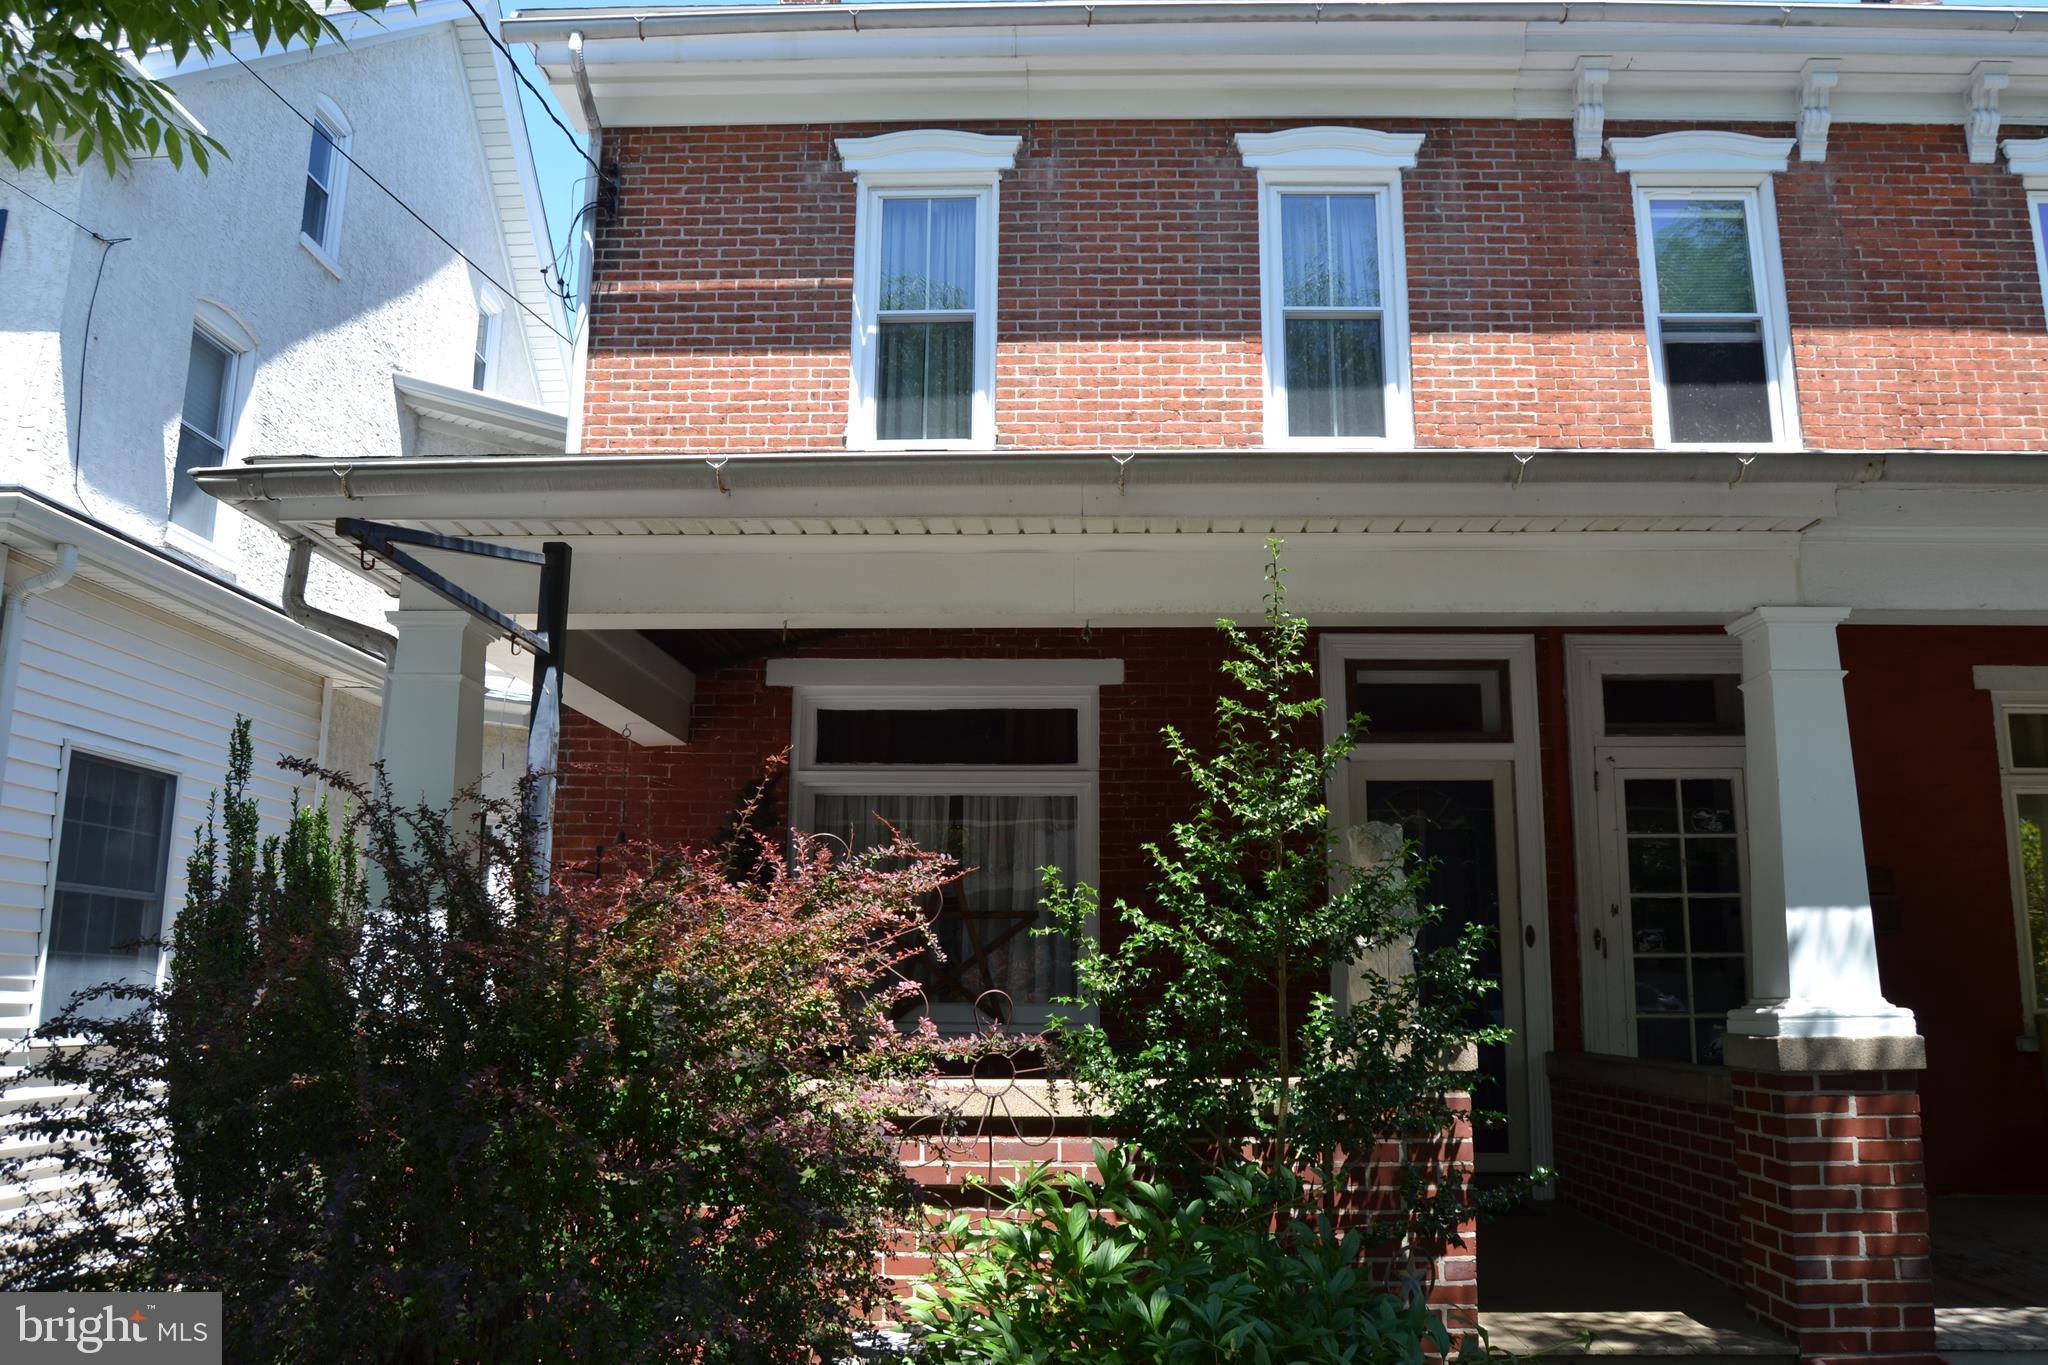 219 MAIN STREET, EAST GREENVILLE, PA 18041